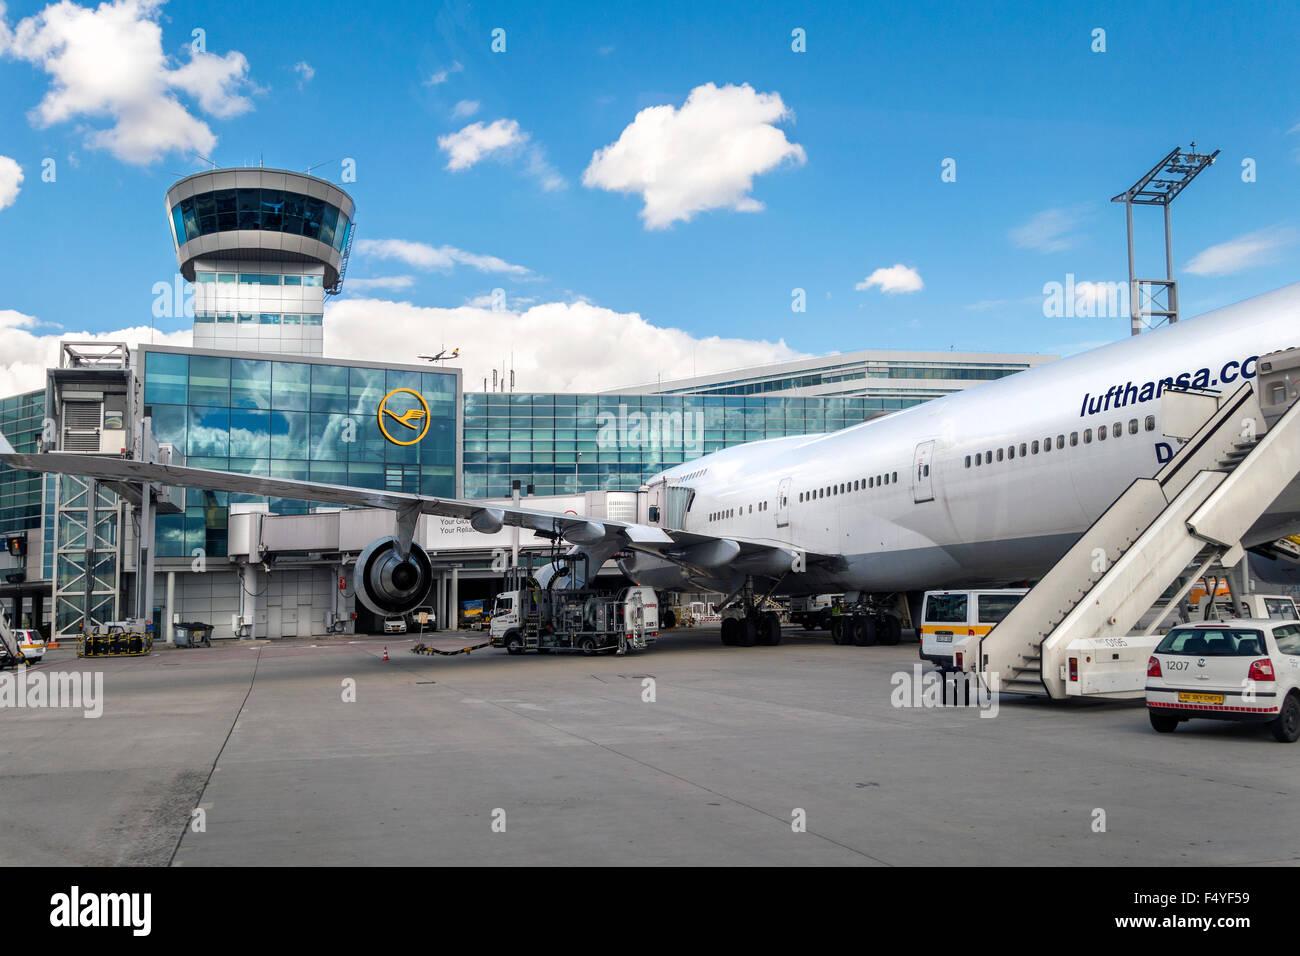 Frankfurt International Airport with Lufthansa Boeing 747 plane at the gate. - Stock Image